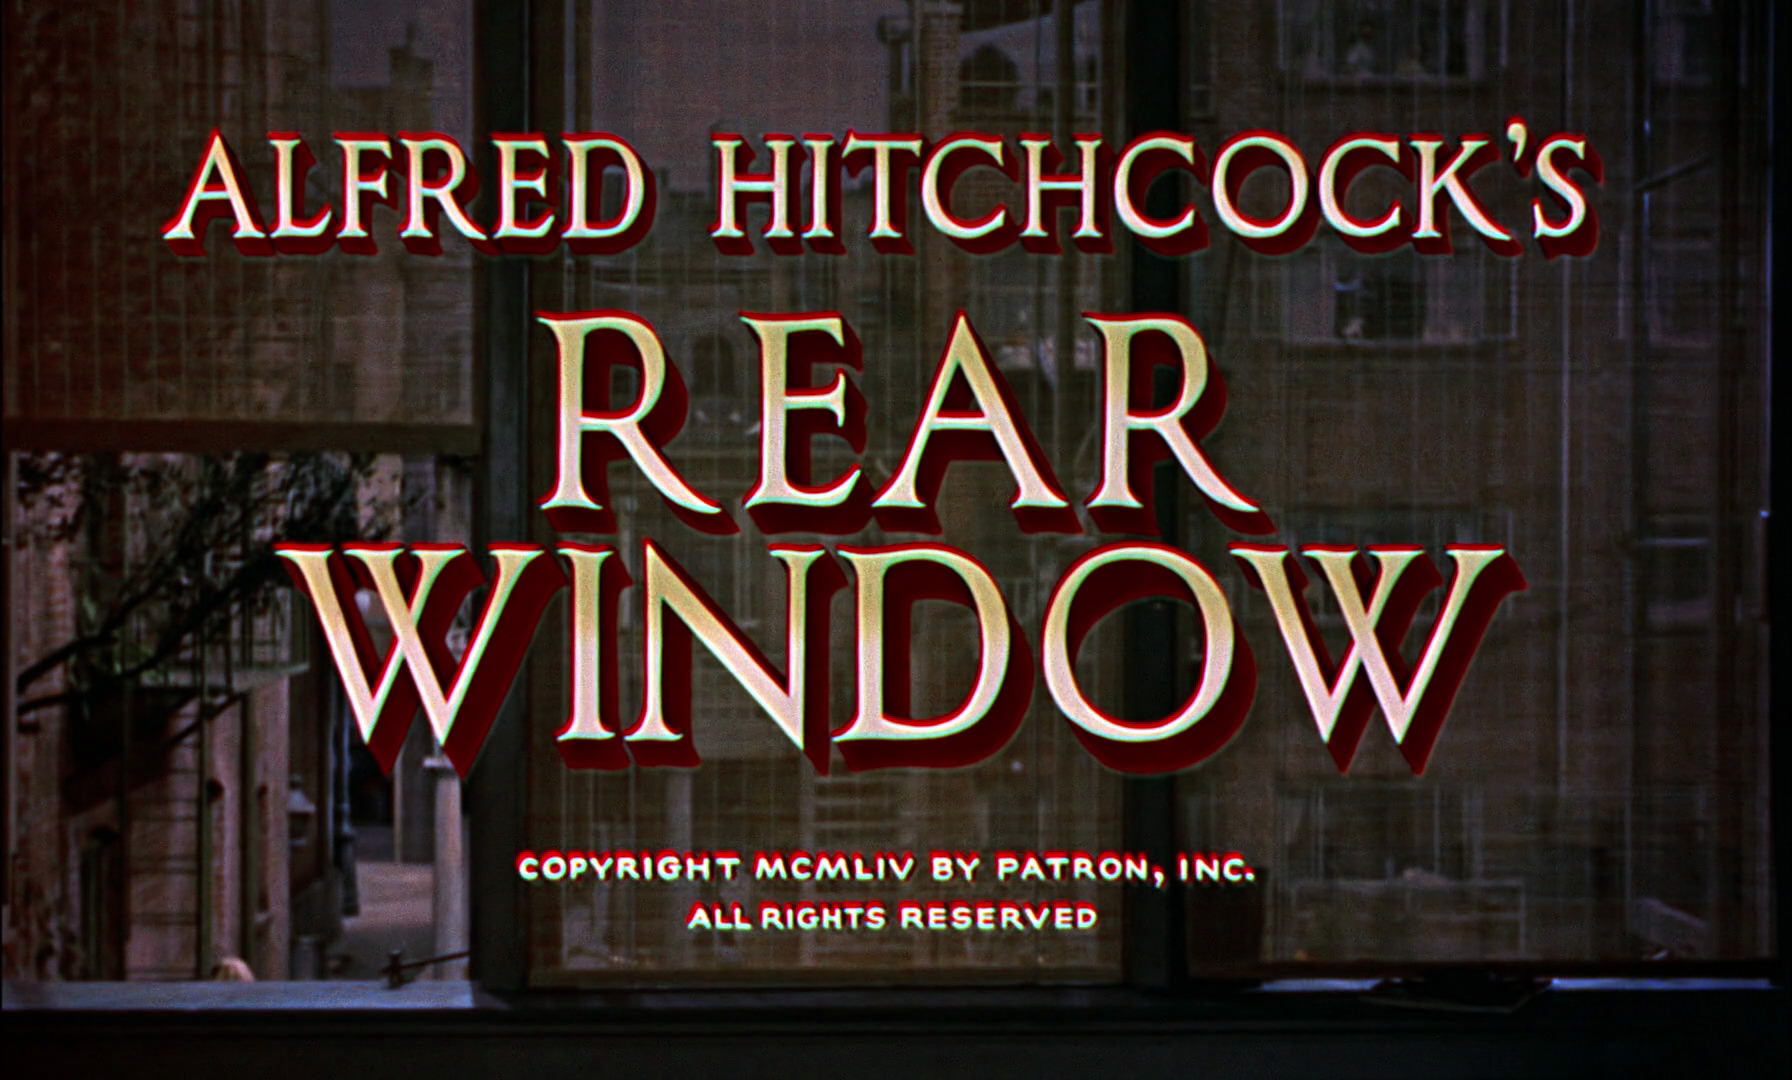 rear window movie download 720p